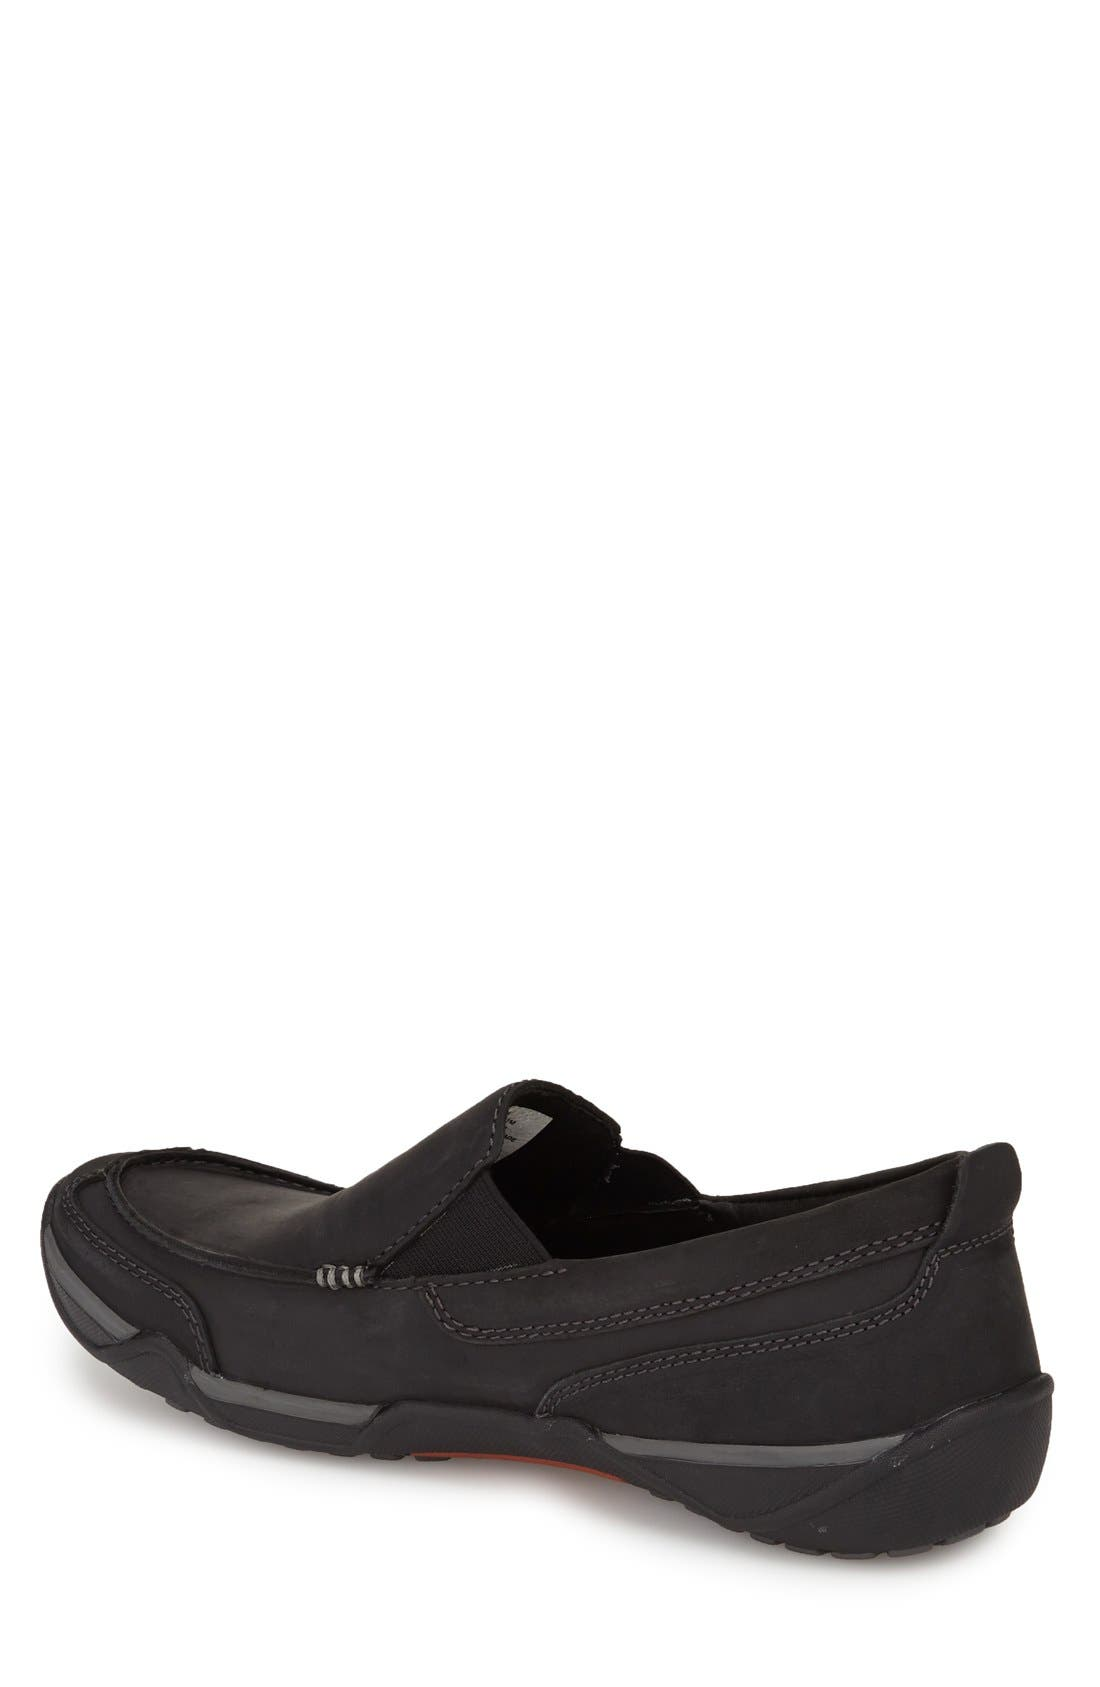 Markis Moc Toe Slip-On,                             Alternate thumbnail 2, color,                             Black Leather